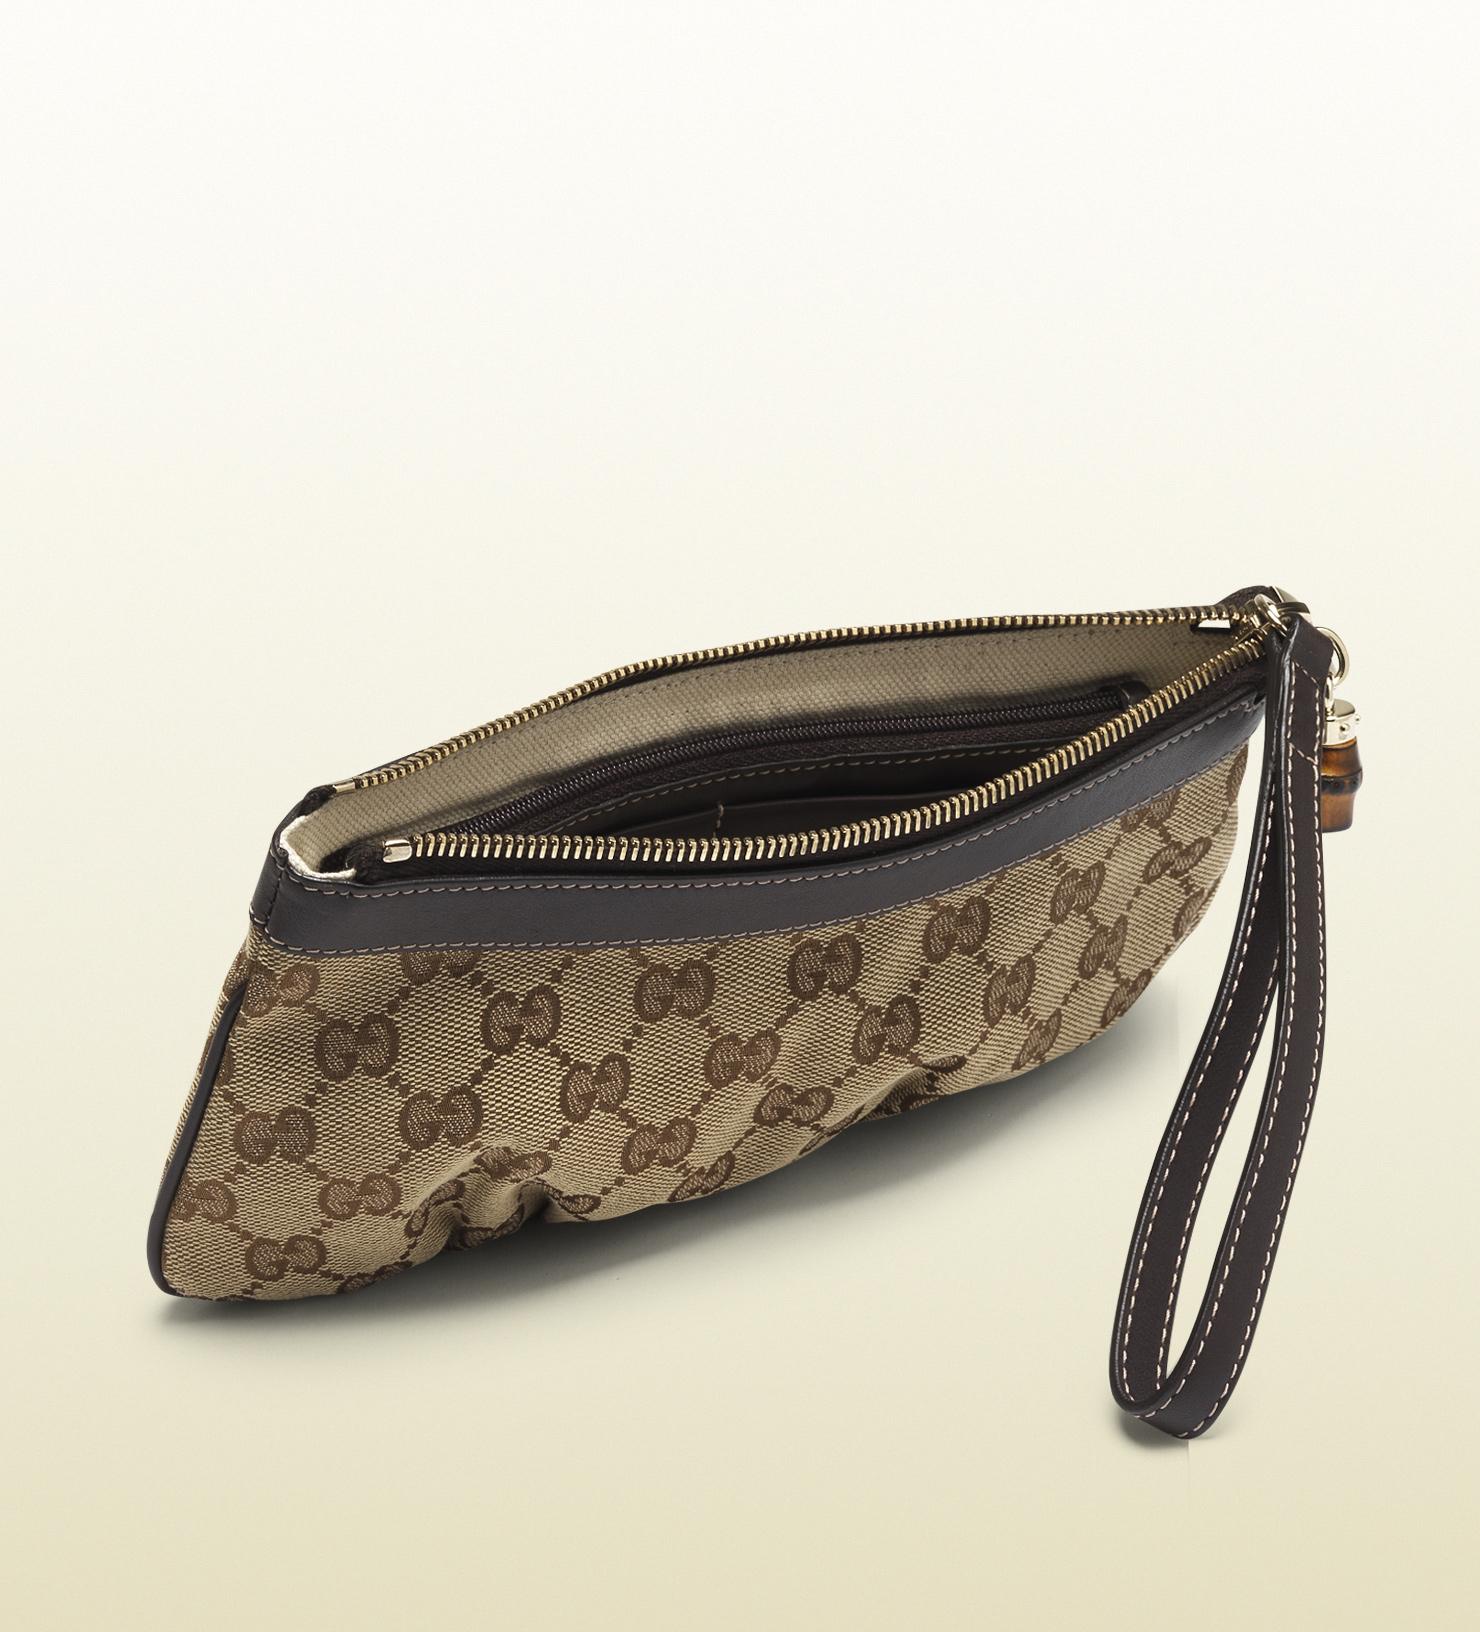 Gucci Original Gg Canvas Wristlet in Brown for Men